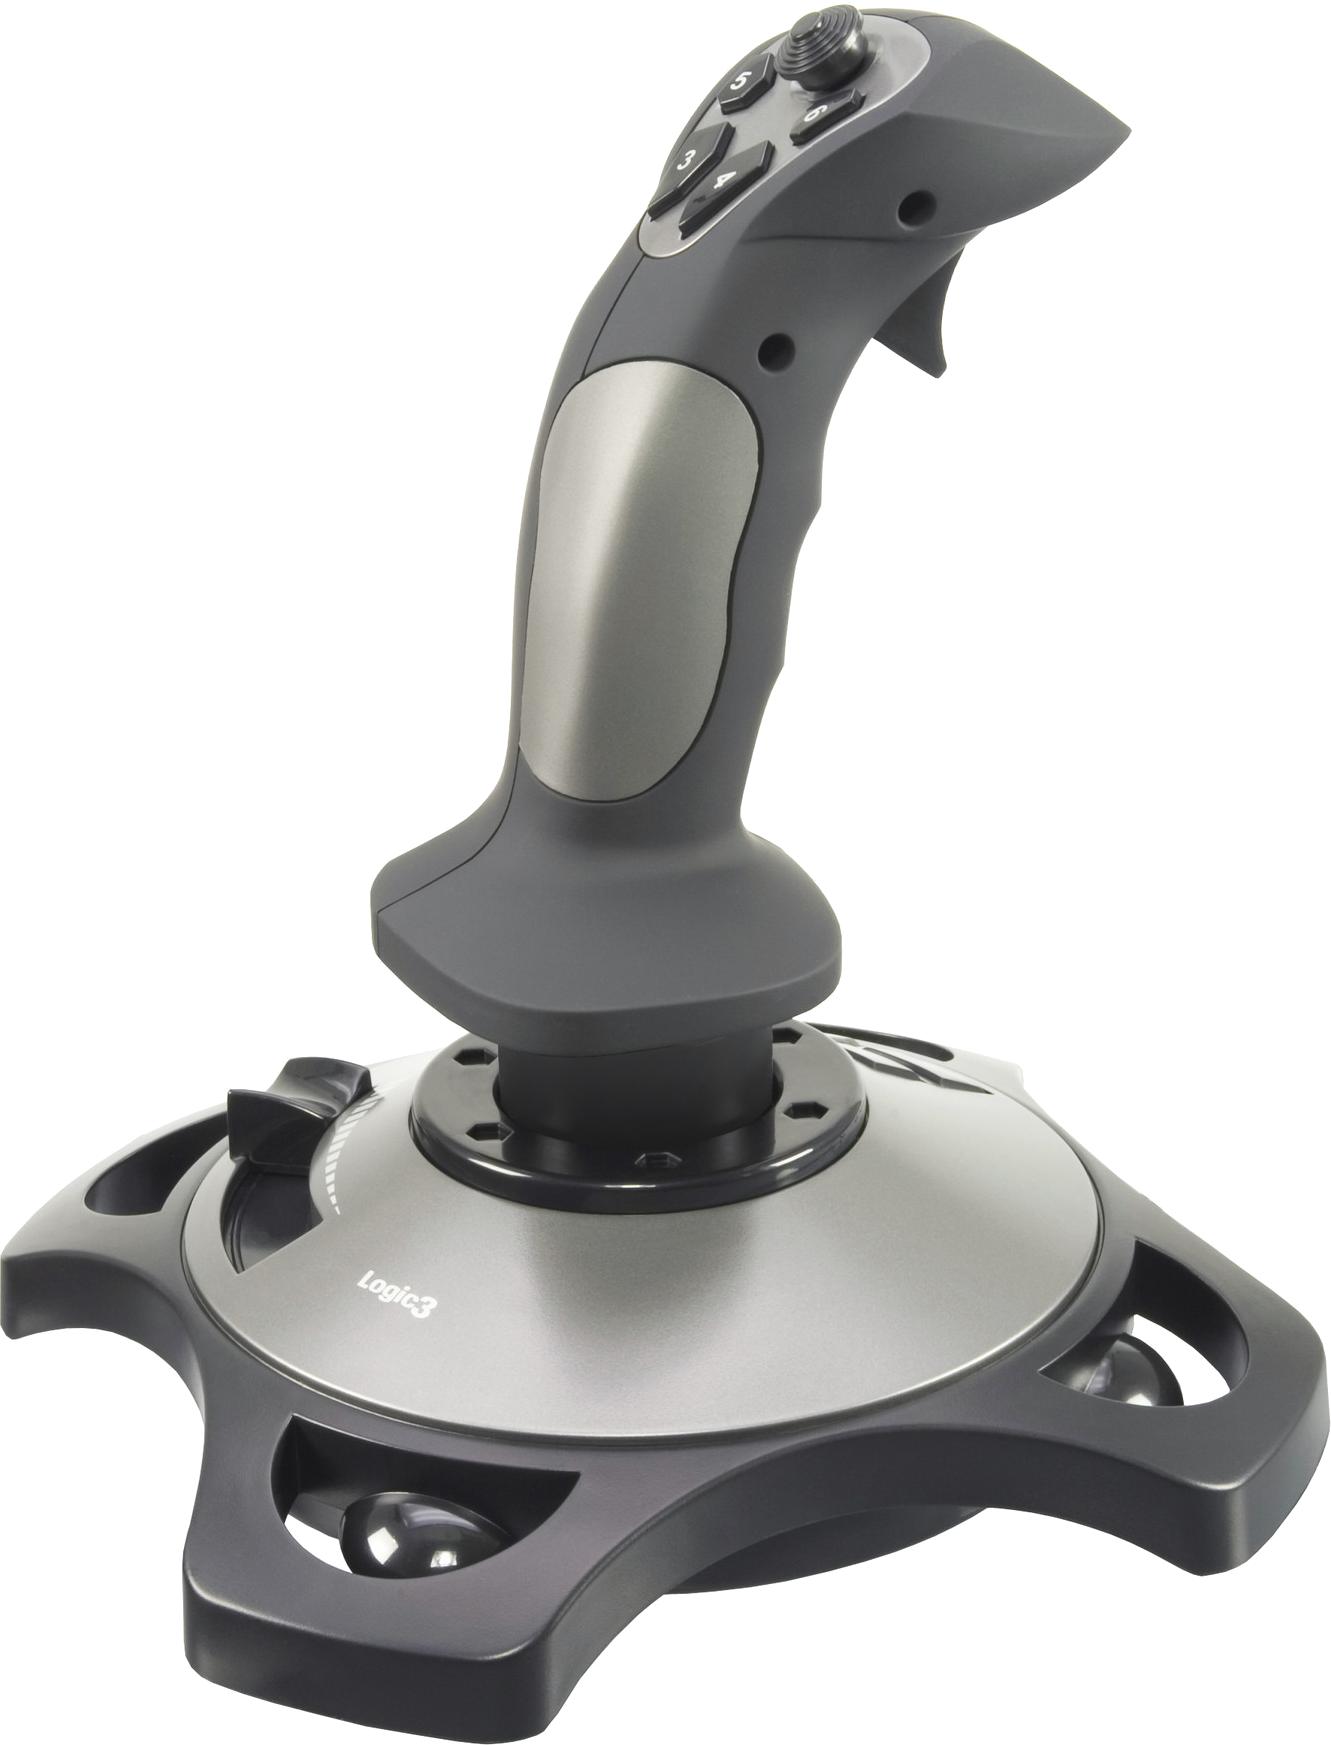 Logic 3 Silver Joystick PNG Image